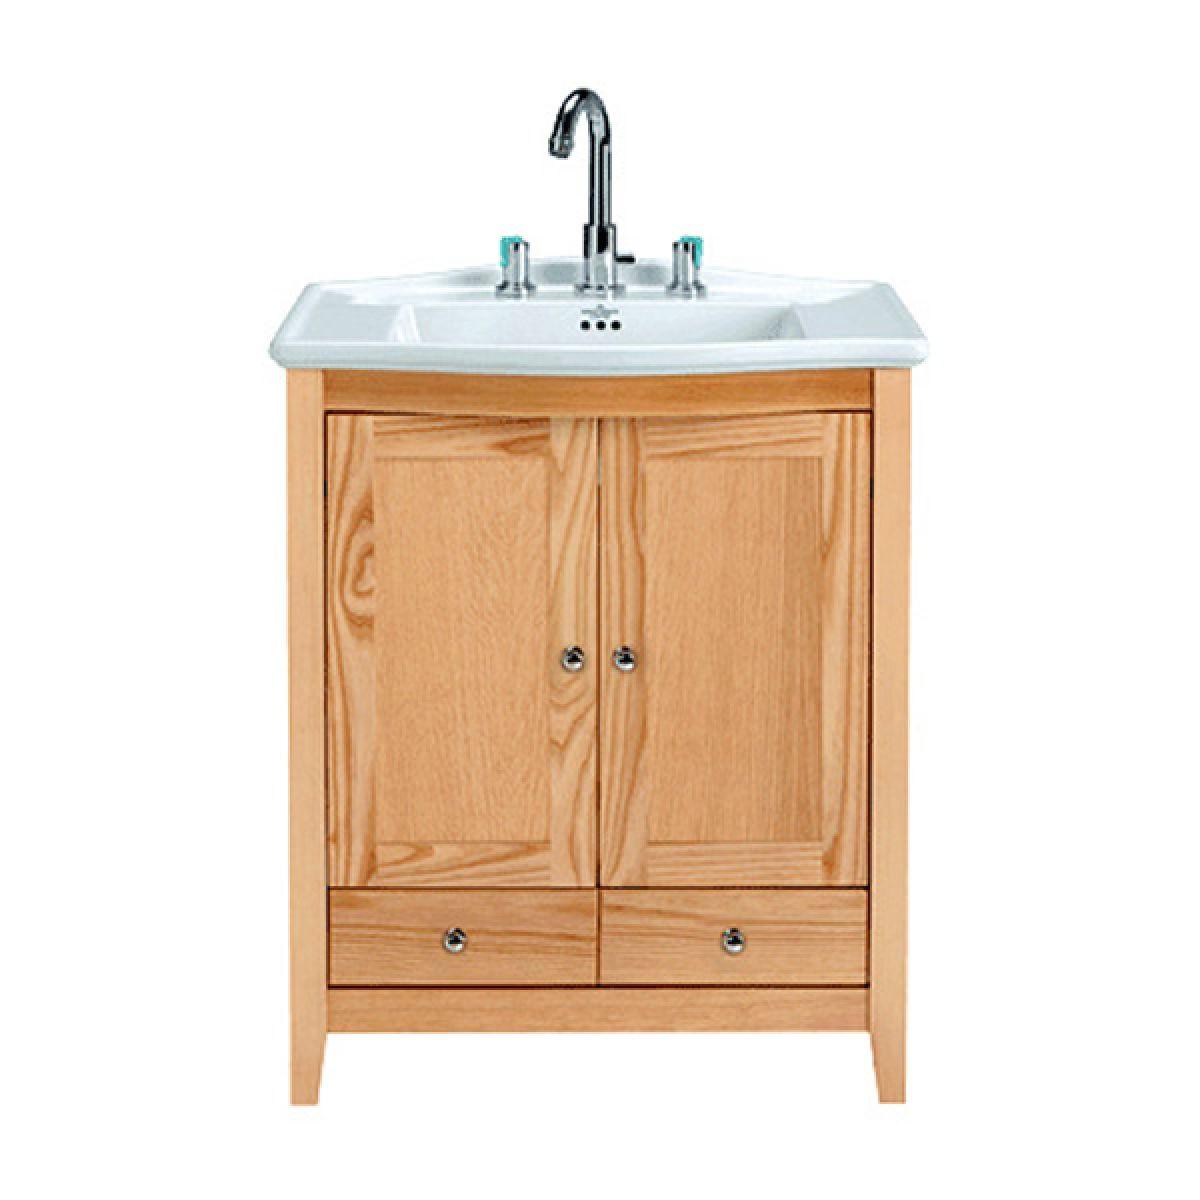 Vanity Unit 2 Tap Hole Basin Compare Bathroom Furniture Prices Ask Home Design